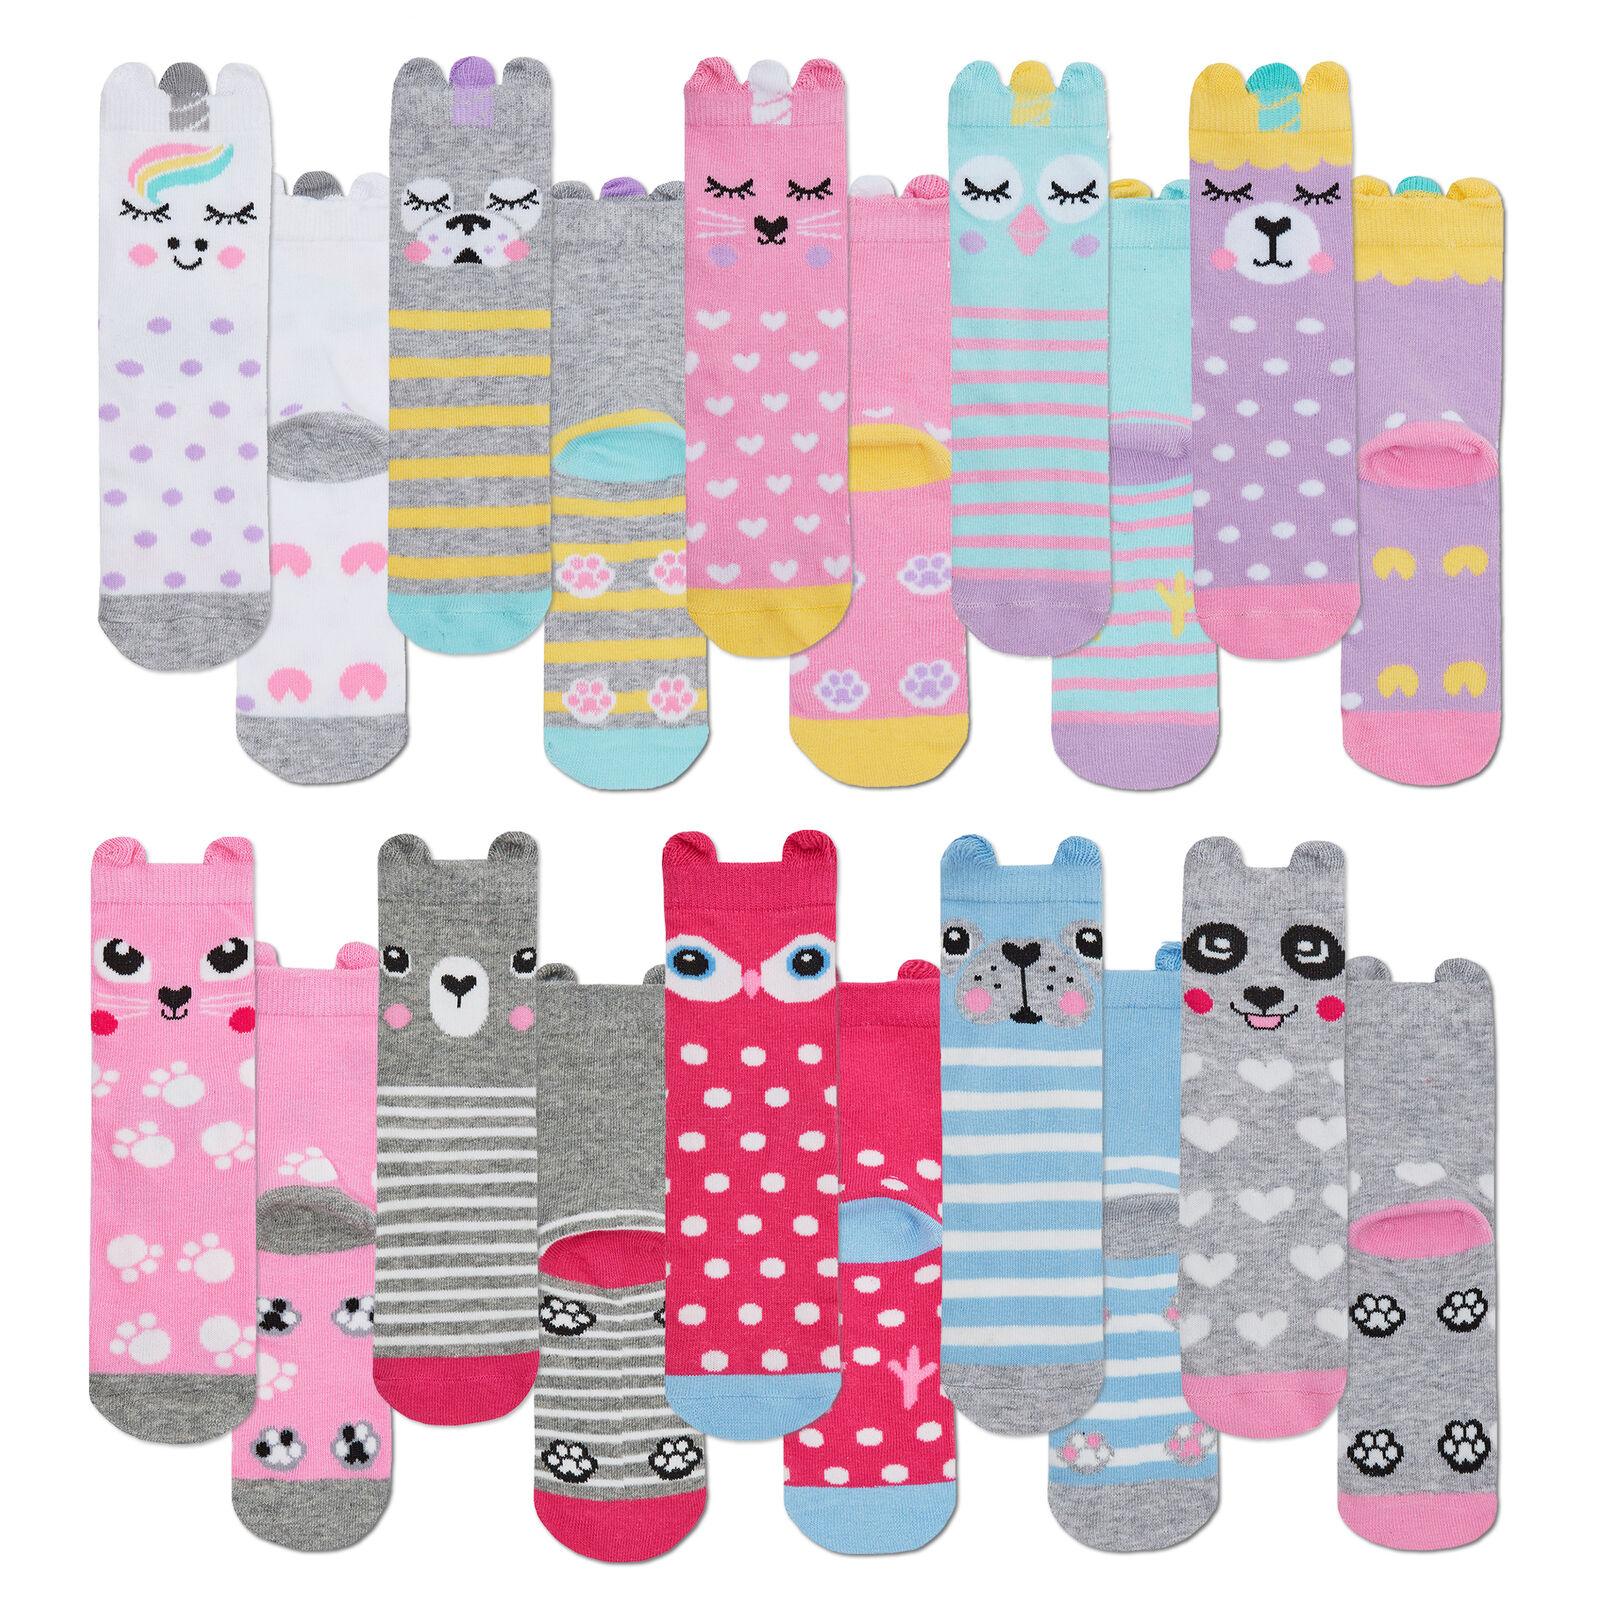 ** 5 10 Pairs Girls Childrens Funny Cool Socks Ears Unicorn Owl Striped Dog Cat